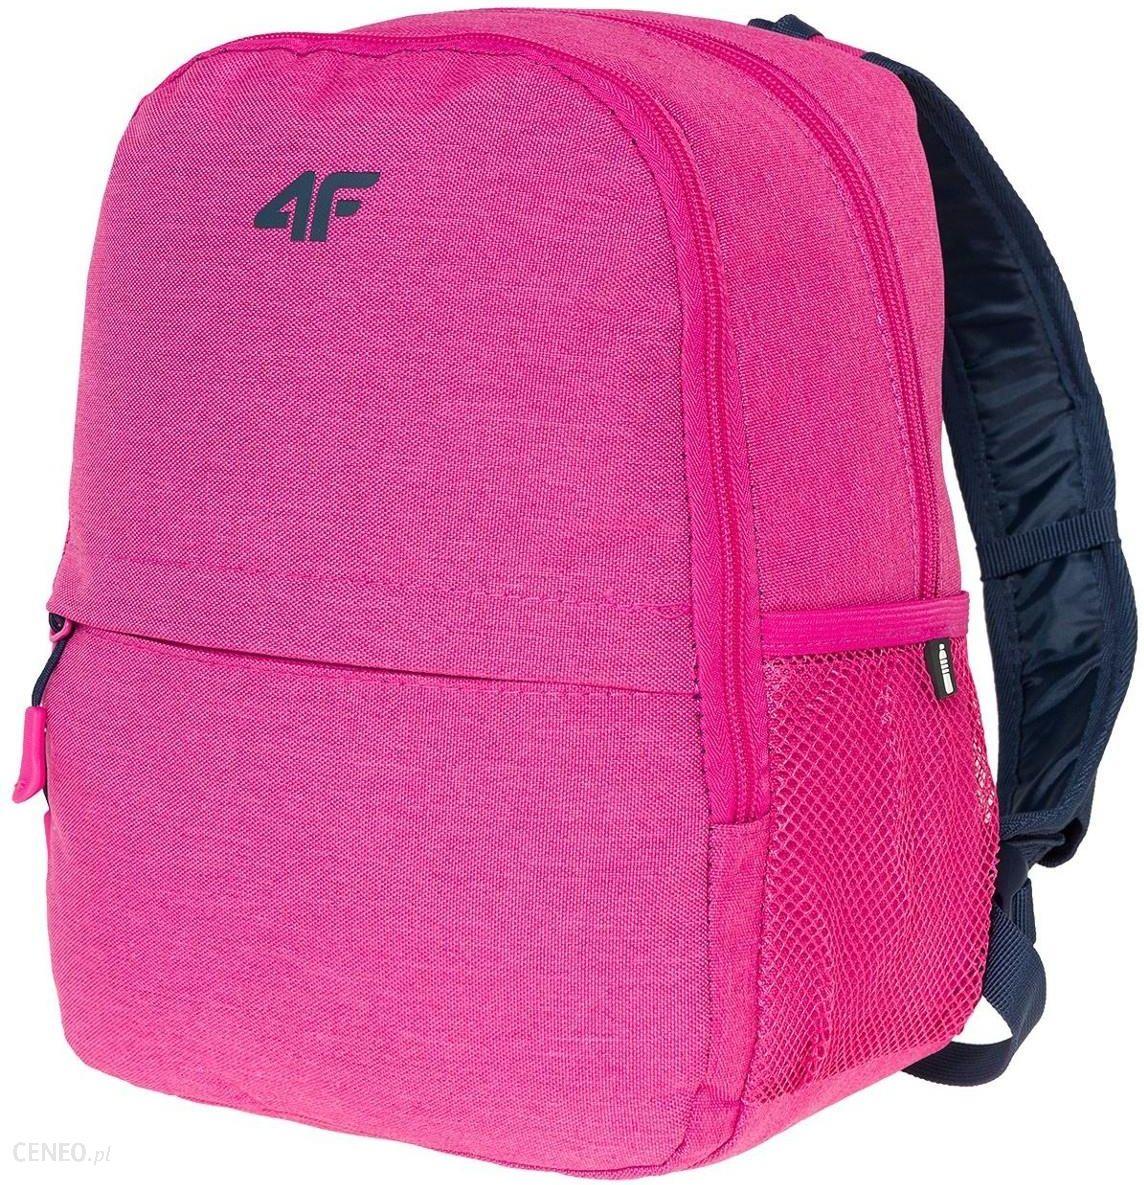 3ad066fd573b7 Plecak 4F H4L18 Pcu002 7L Różowy - Ceny i opinie - Ceneo.pl